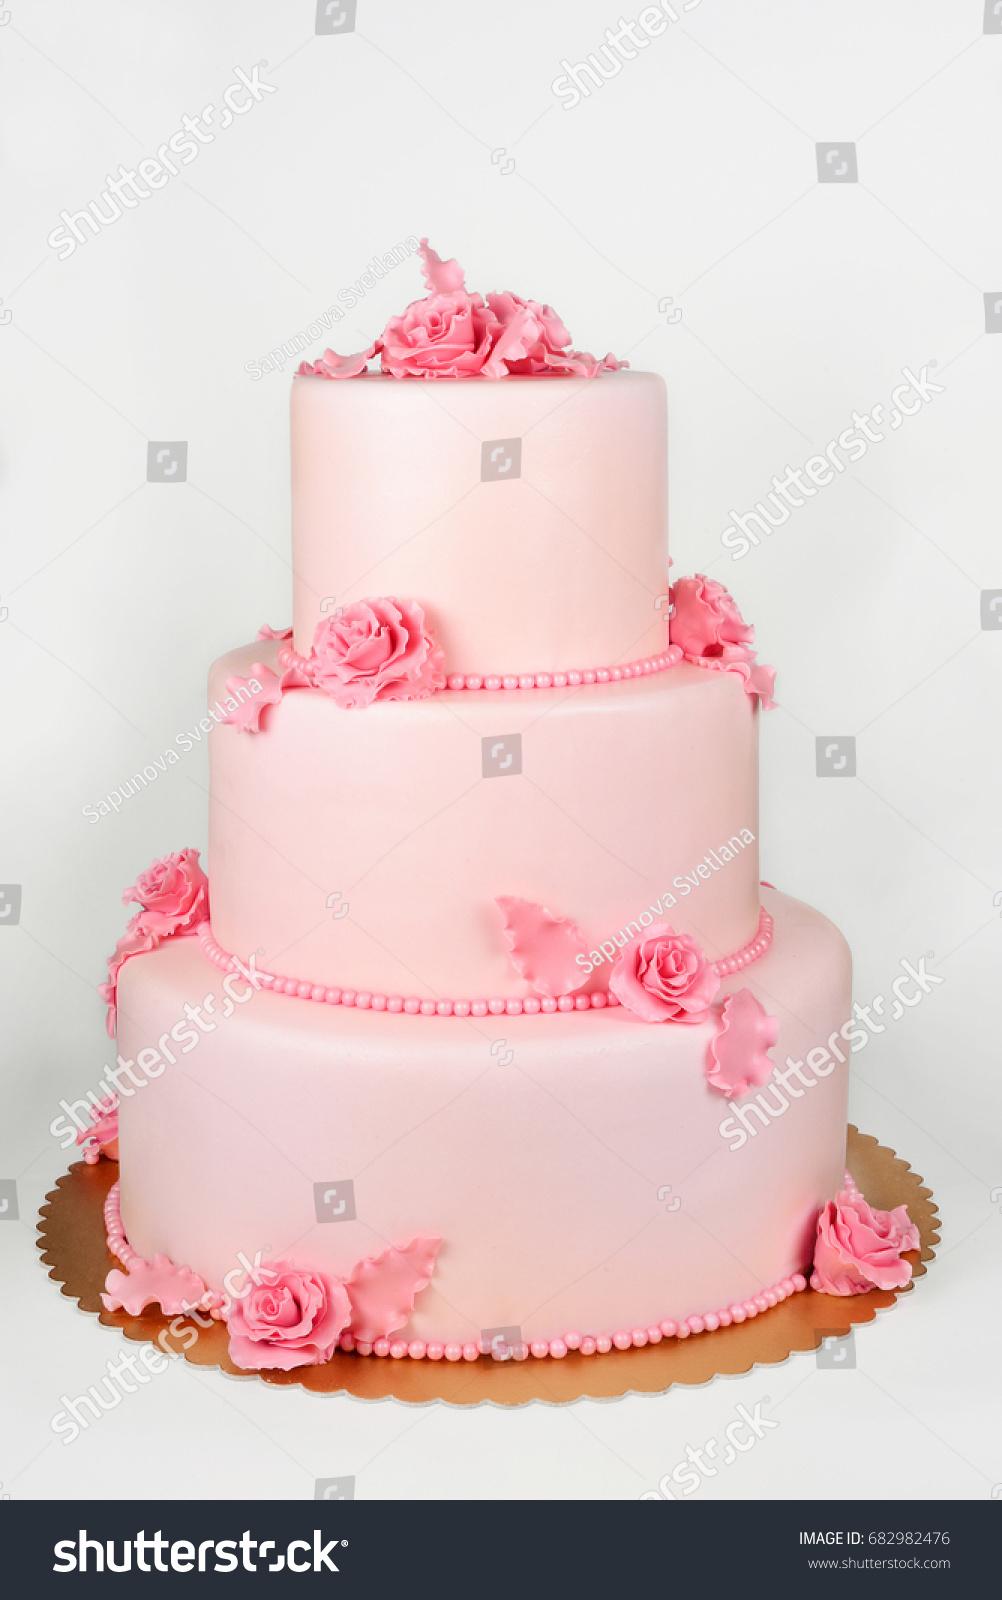 Big cake on white | EZ Canvas